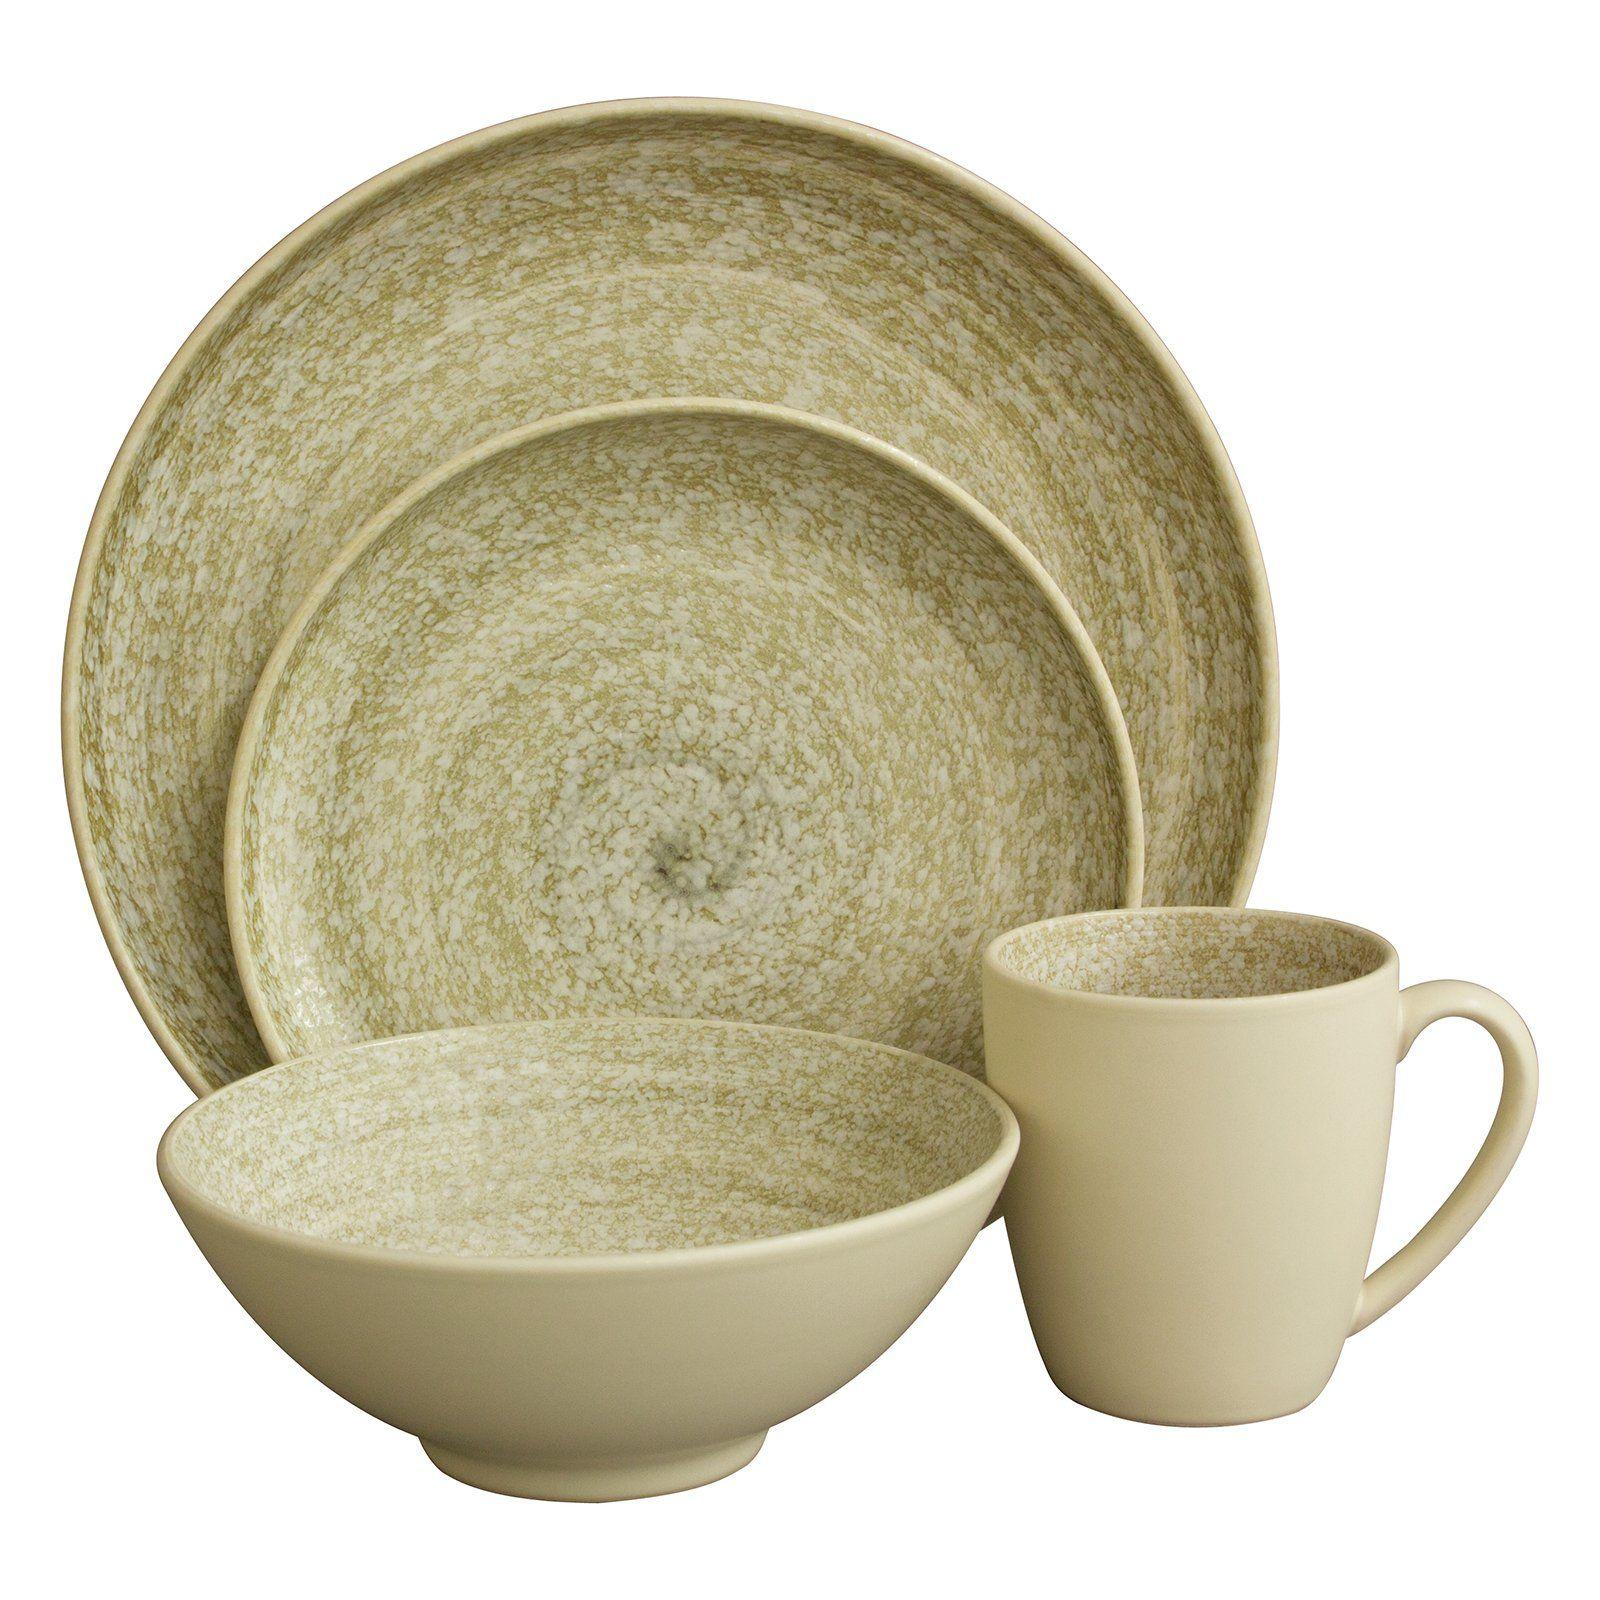 Sango Soho Dinnerware - Cream - Set of 16 $59.99  sc 1 st  Pinterest & Have to have it. Sango Soho Dinnerware - Cream - Set of 16 $59.99 ...